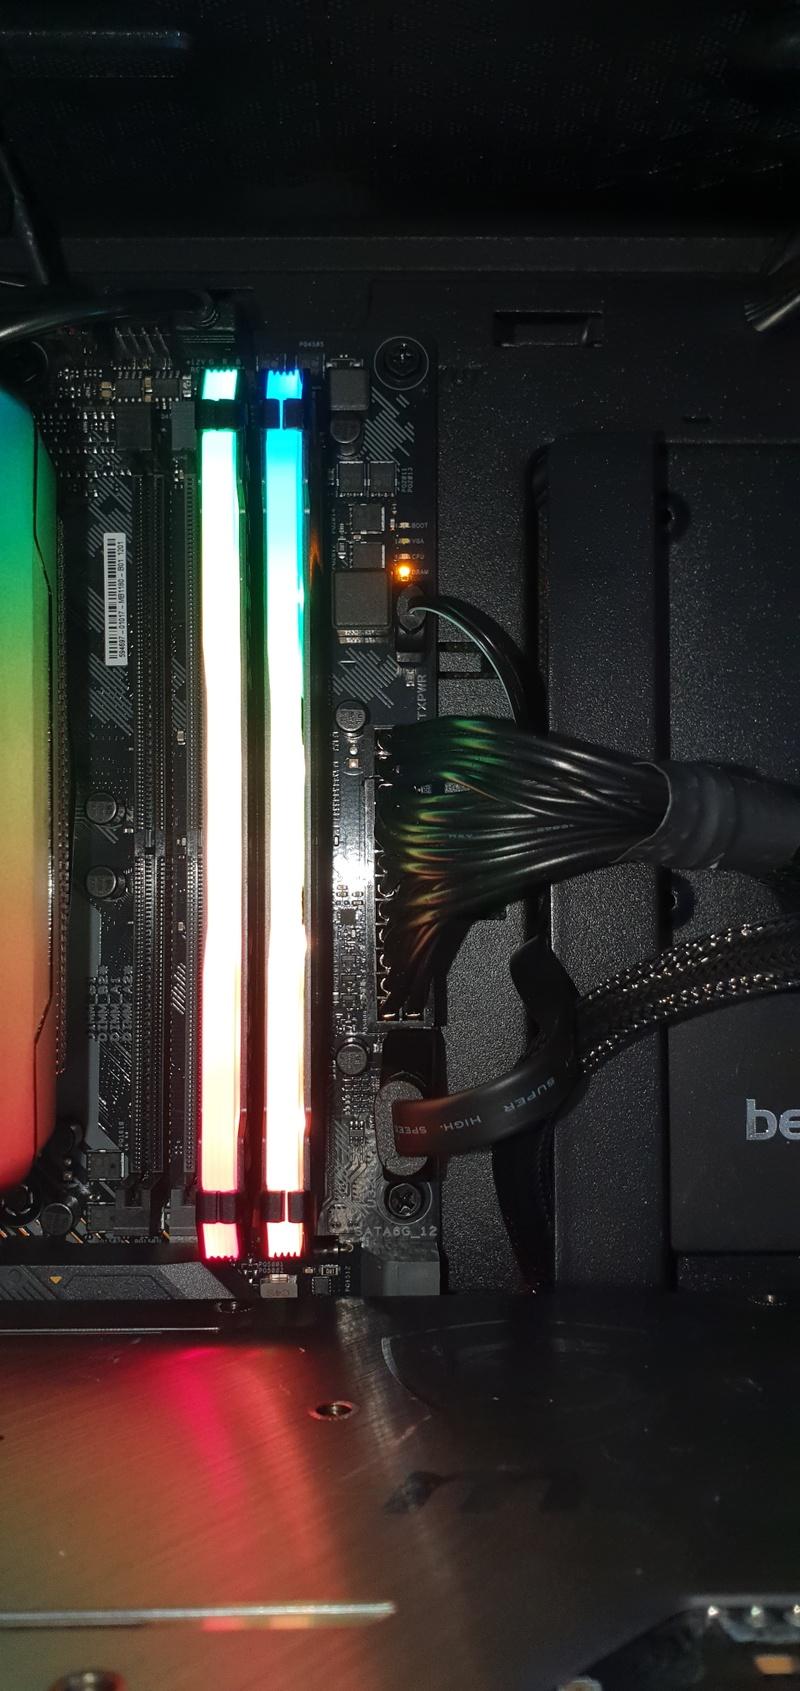 https://tweakers.net/i/ZSghqXzESEbuN8baC5JGUu9nSfE=/800x/filters:strip_icc():strip_exif()/f/image/C1jWNEZViIb6WMR87iQBEH0f.jpg?f=fotoalbum_large